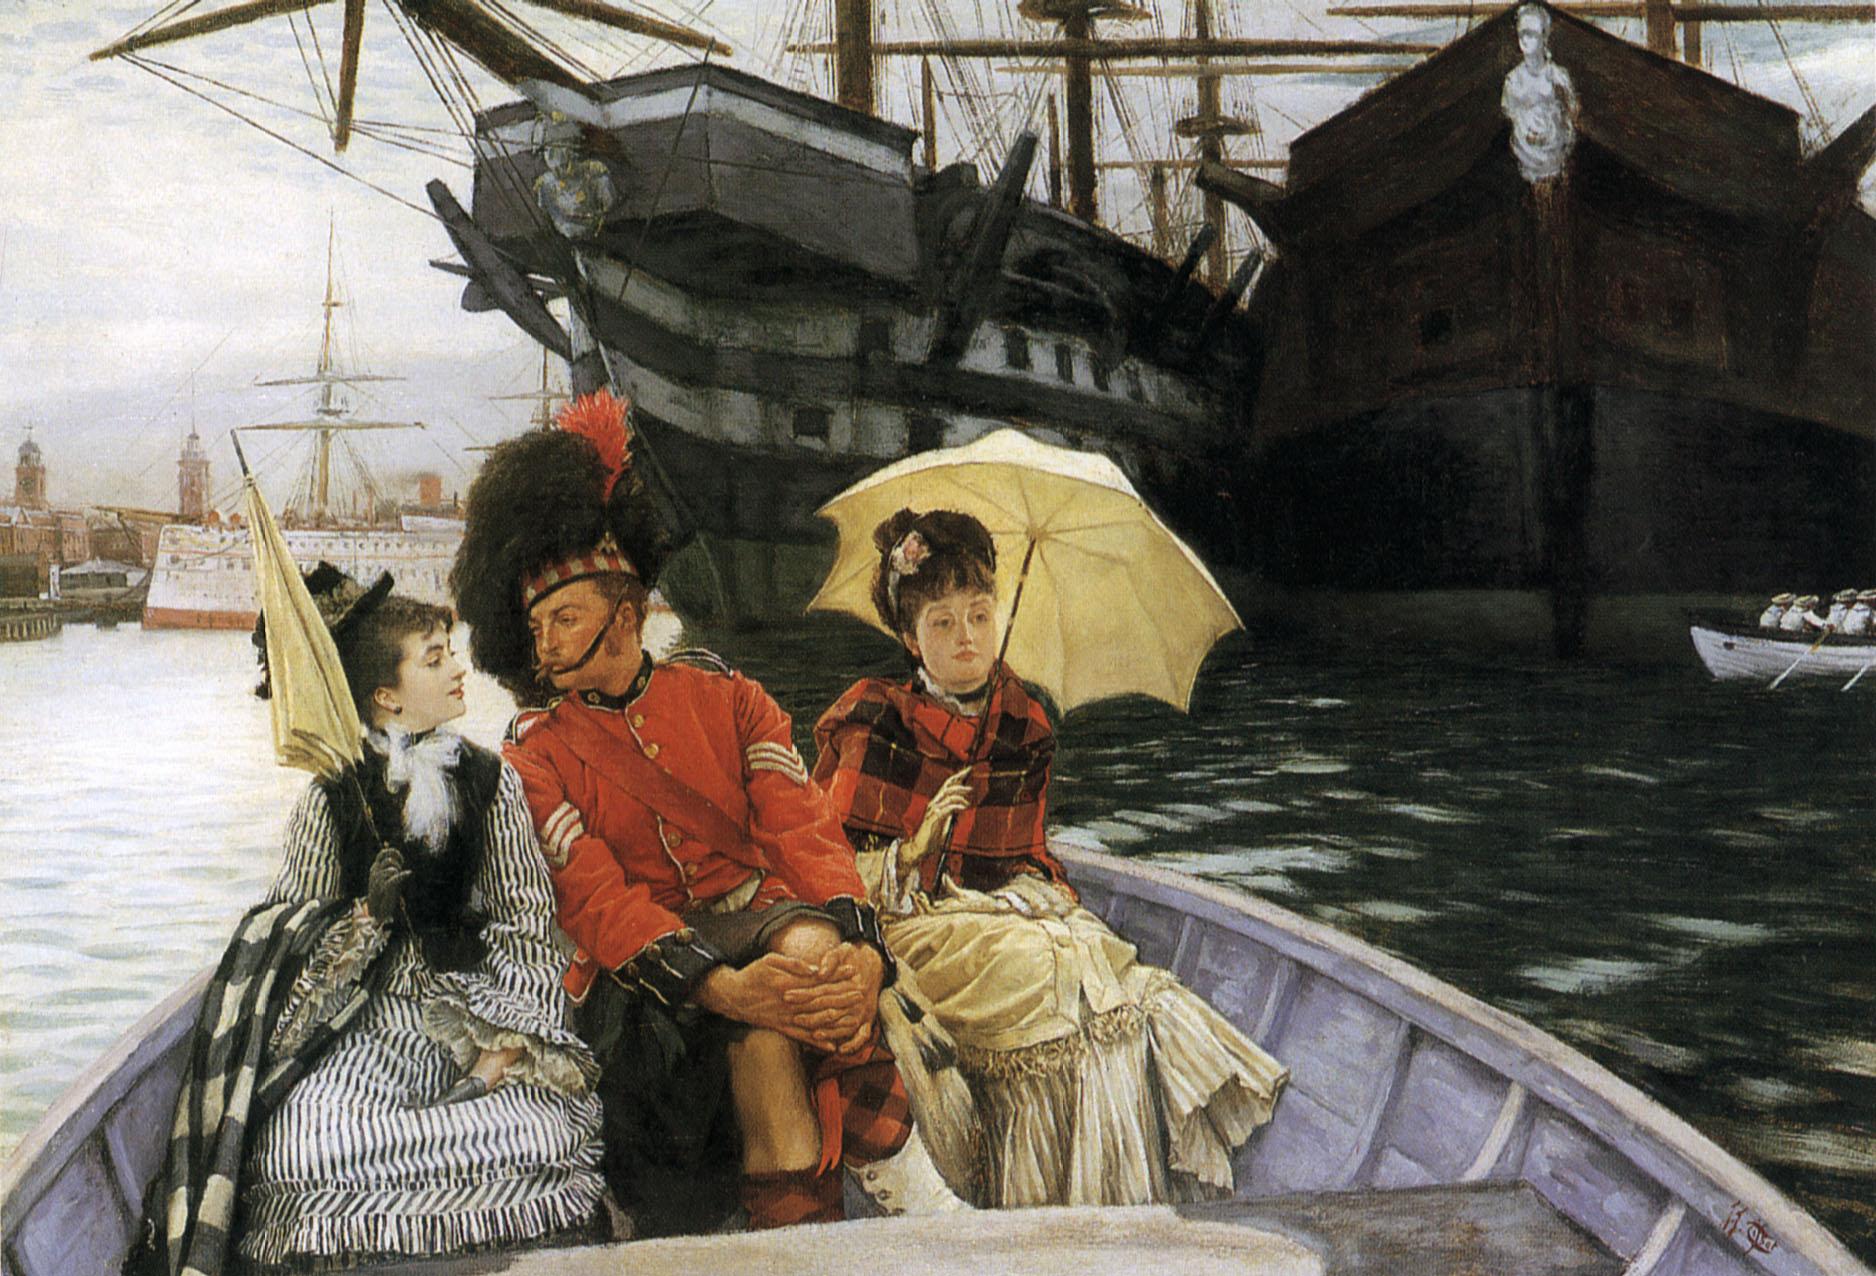 Portsmouth Dockyard by James Tissot 1877 Highlander ironclad and ship of war